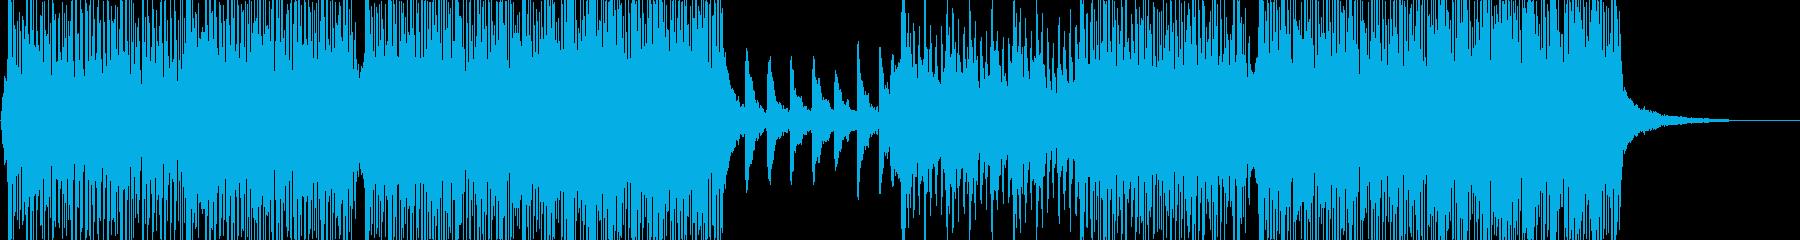 V-LOGなどおしゃれな映像に合う曲の再生済みの波形